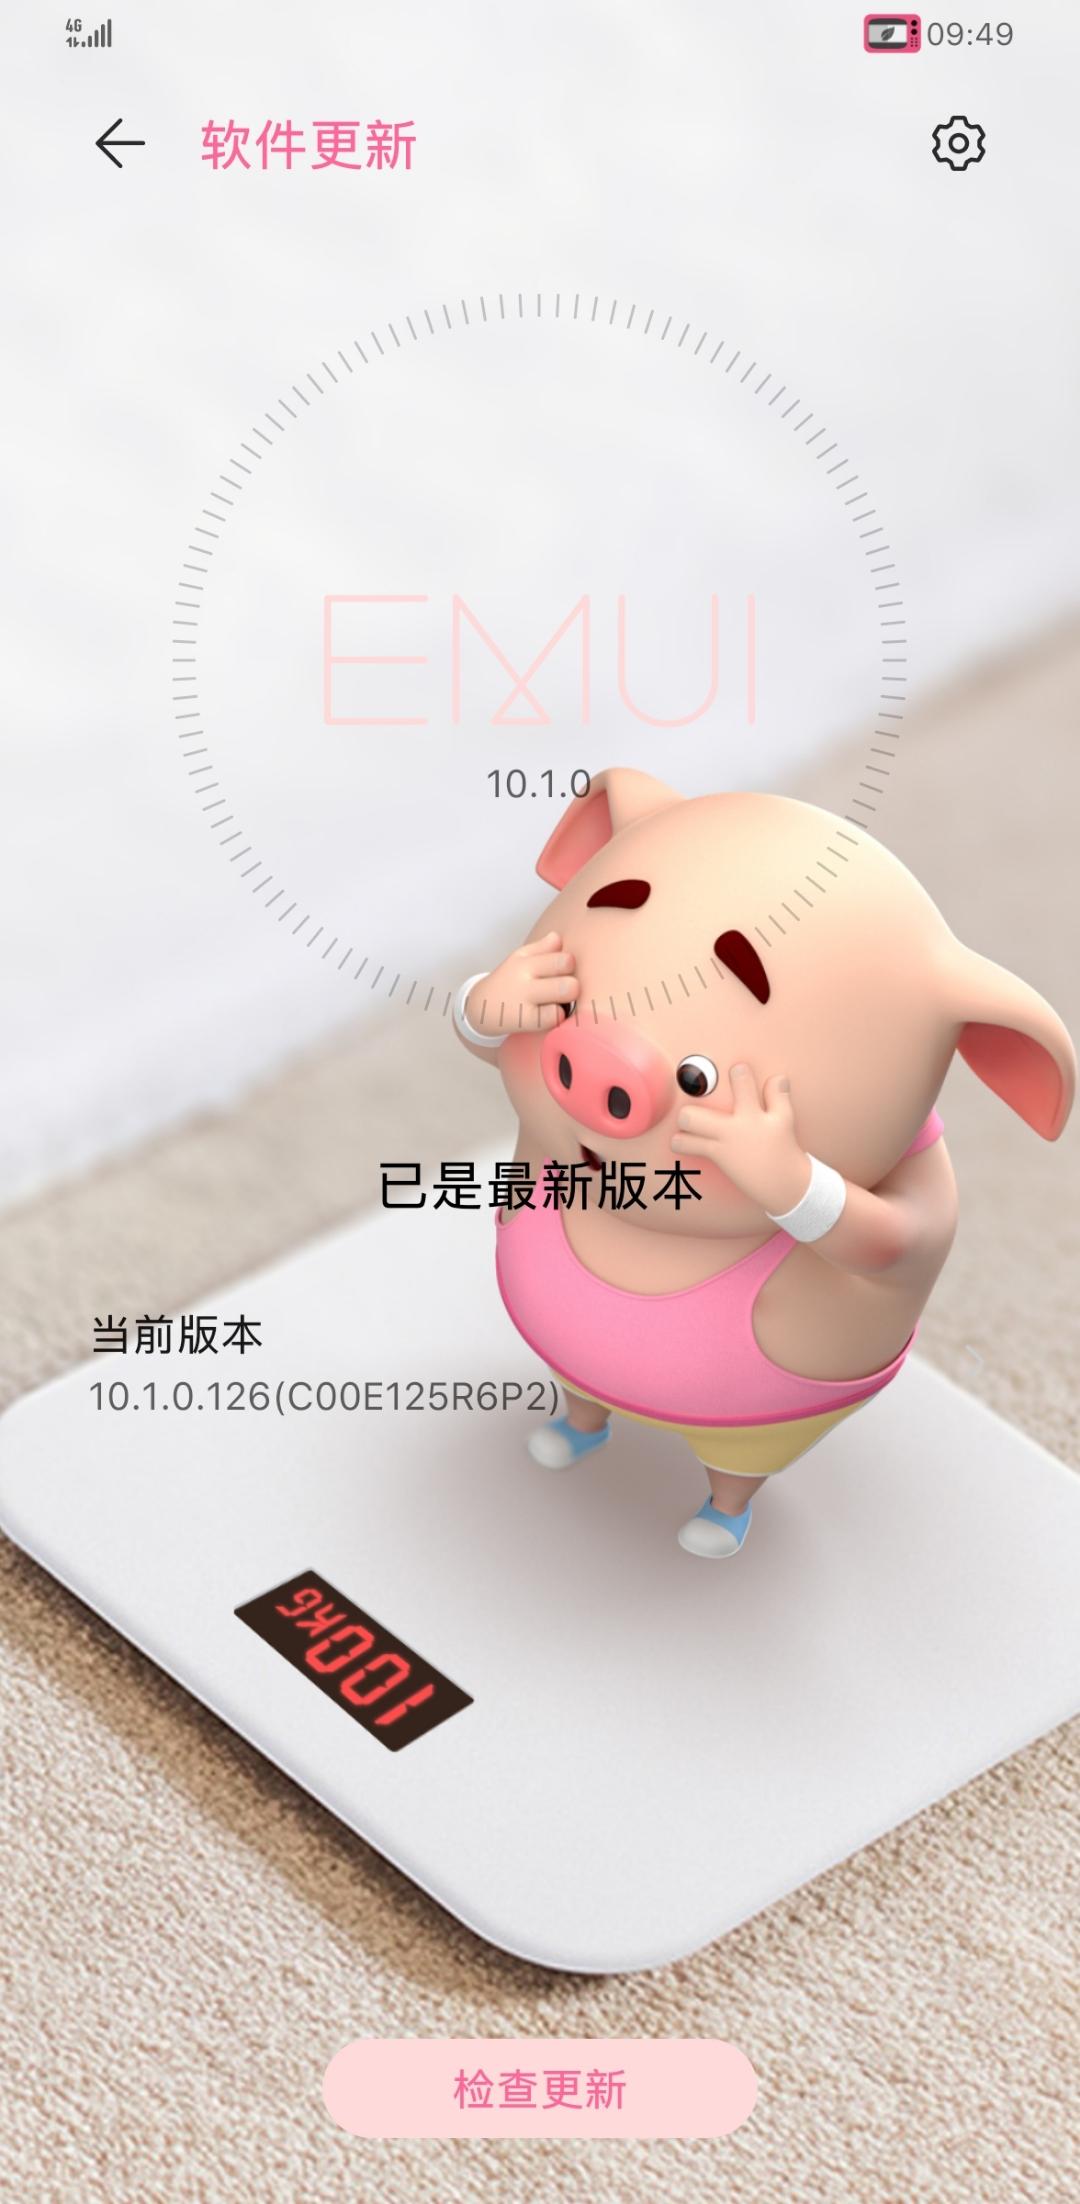 Screenshot_20200514_094939_com.huawei.android.hwouc.jpg